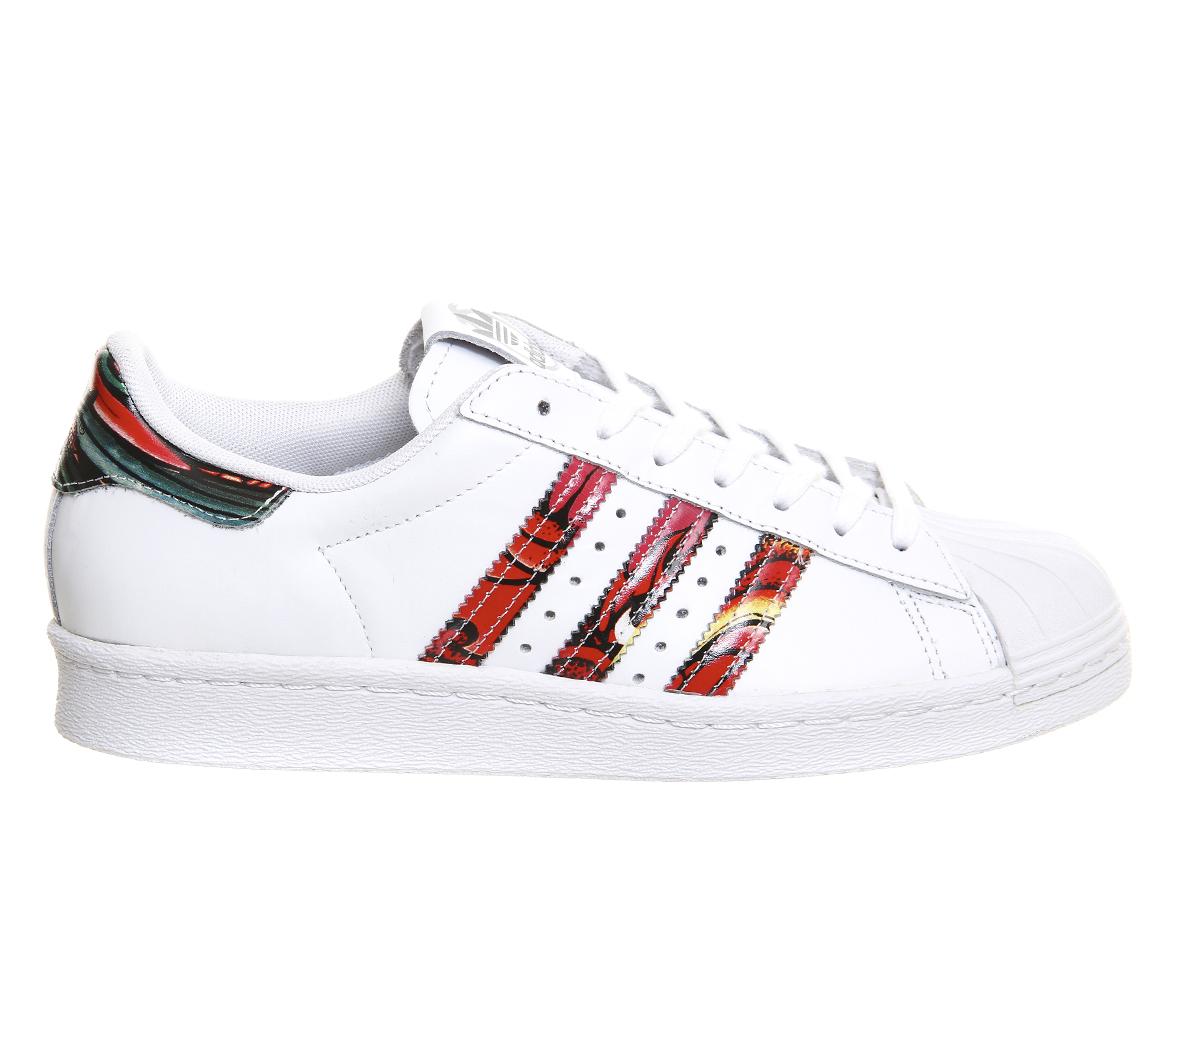 Adidas Superstar Shoes Australia Iconic